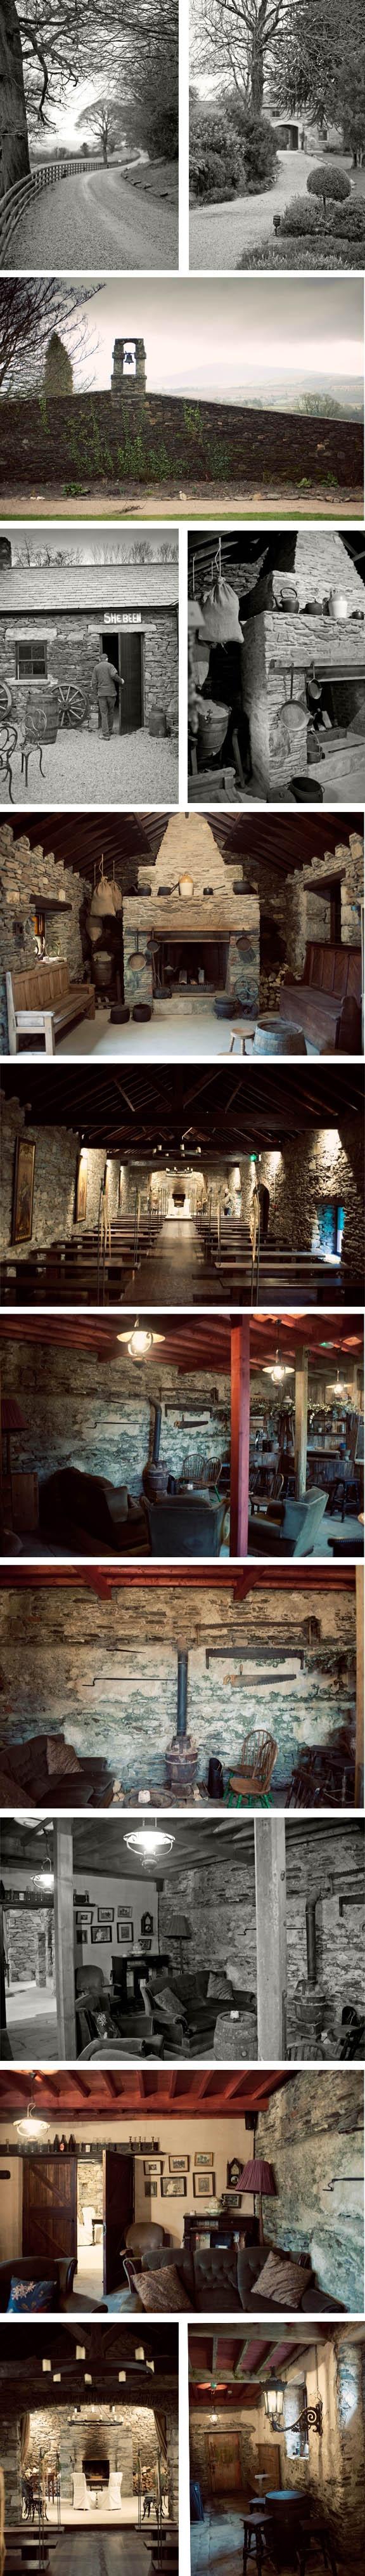 Wedding locations by studio33weddingscom at Ballybeg House